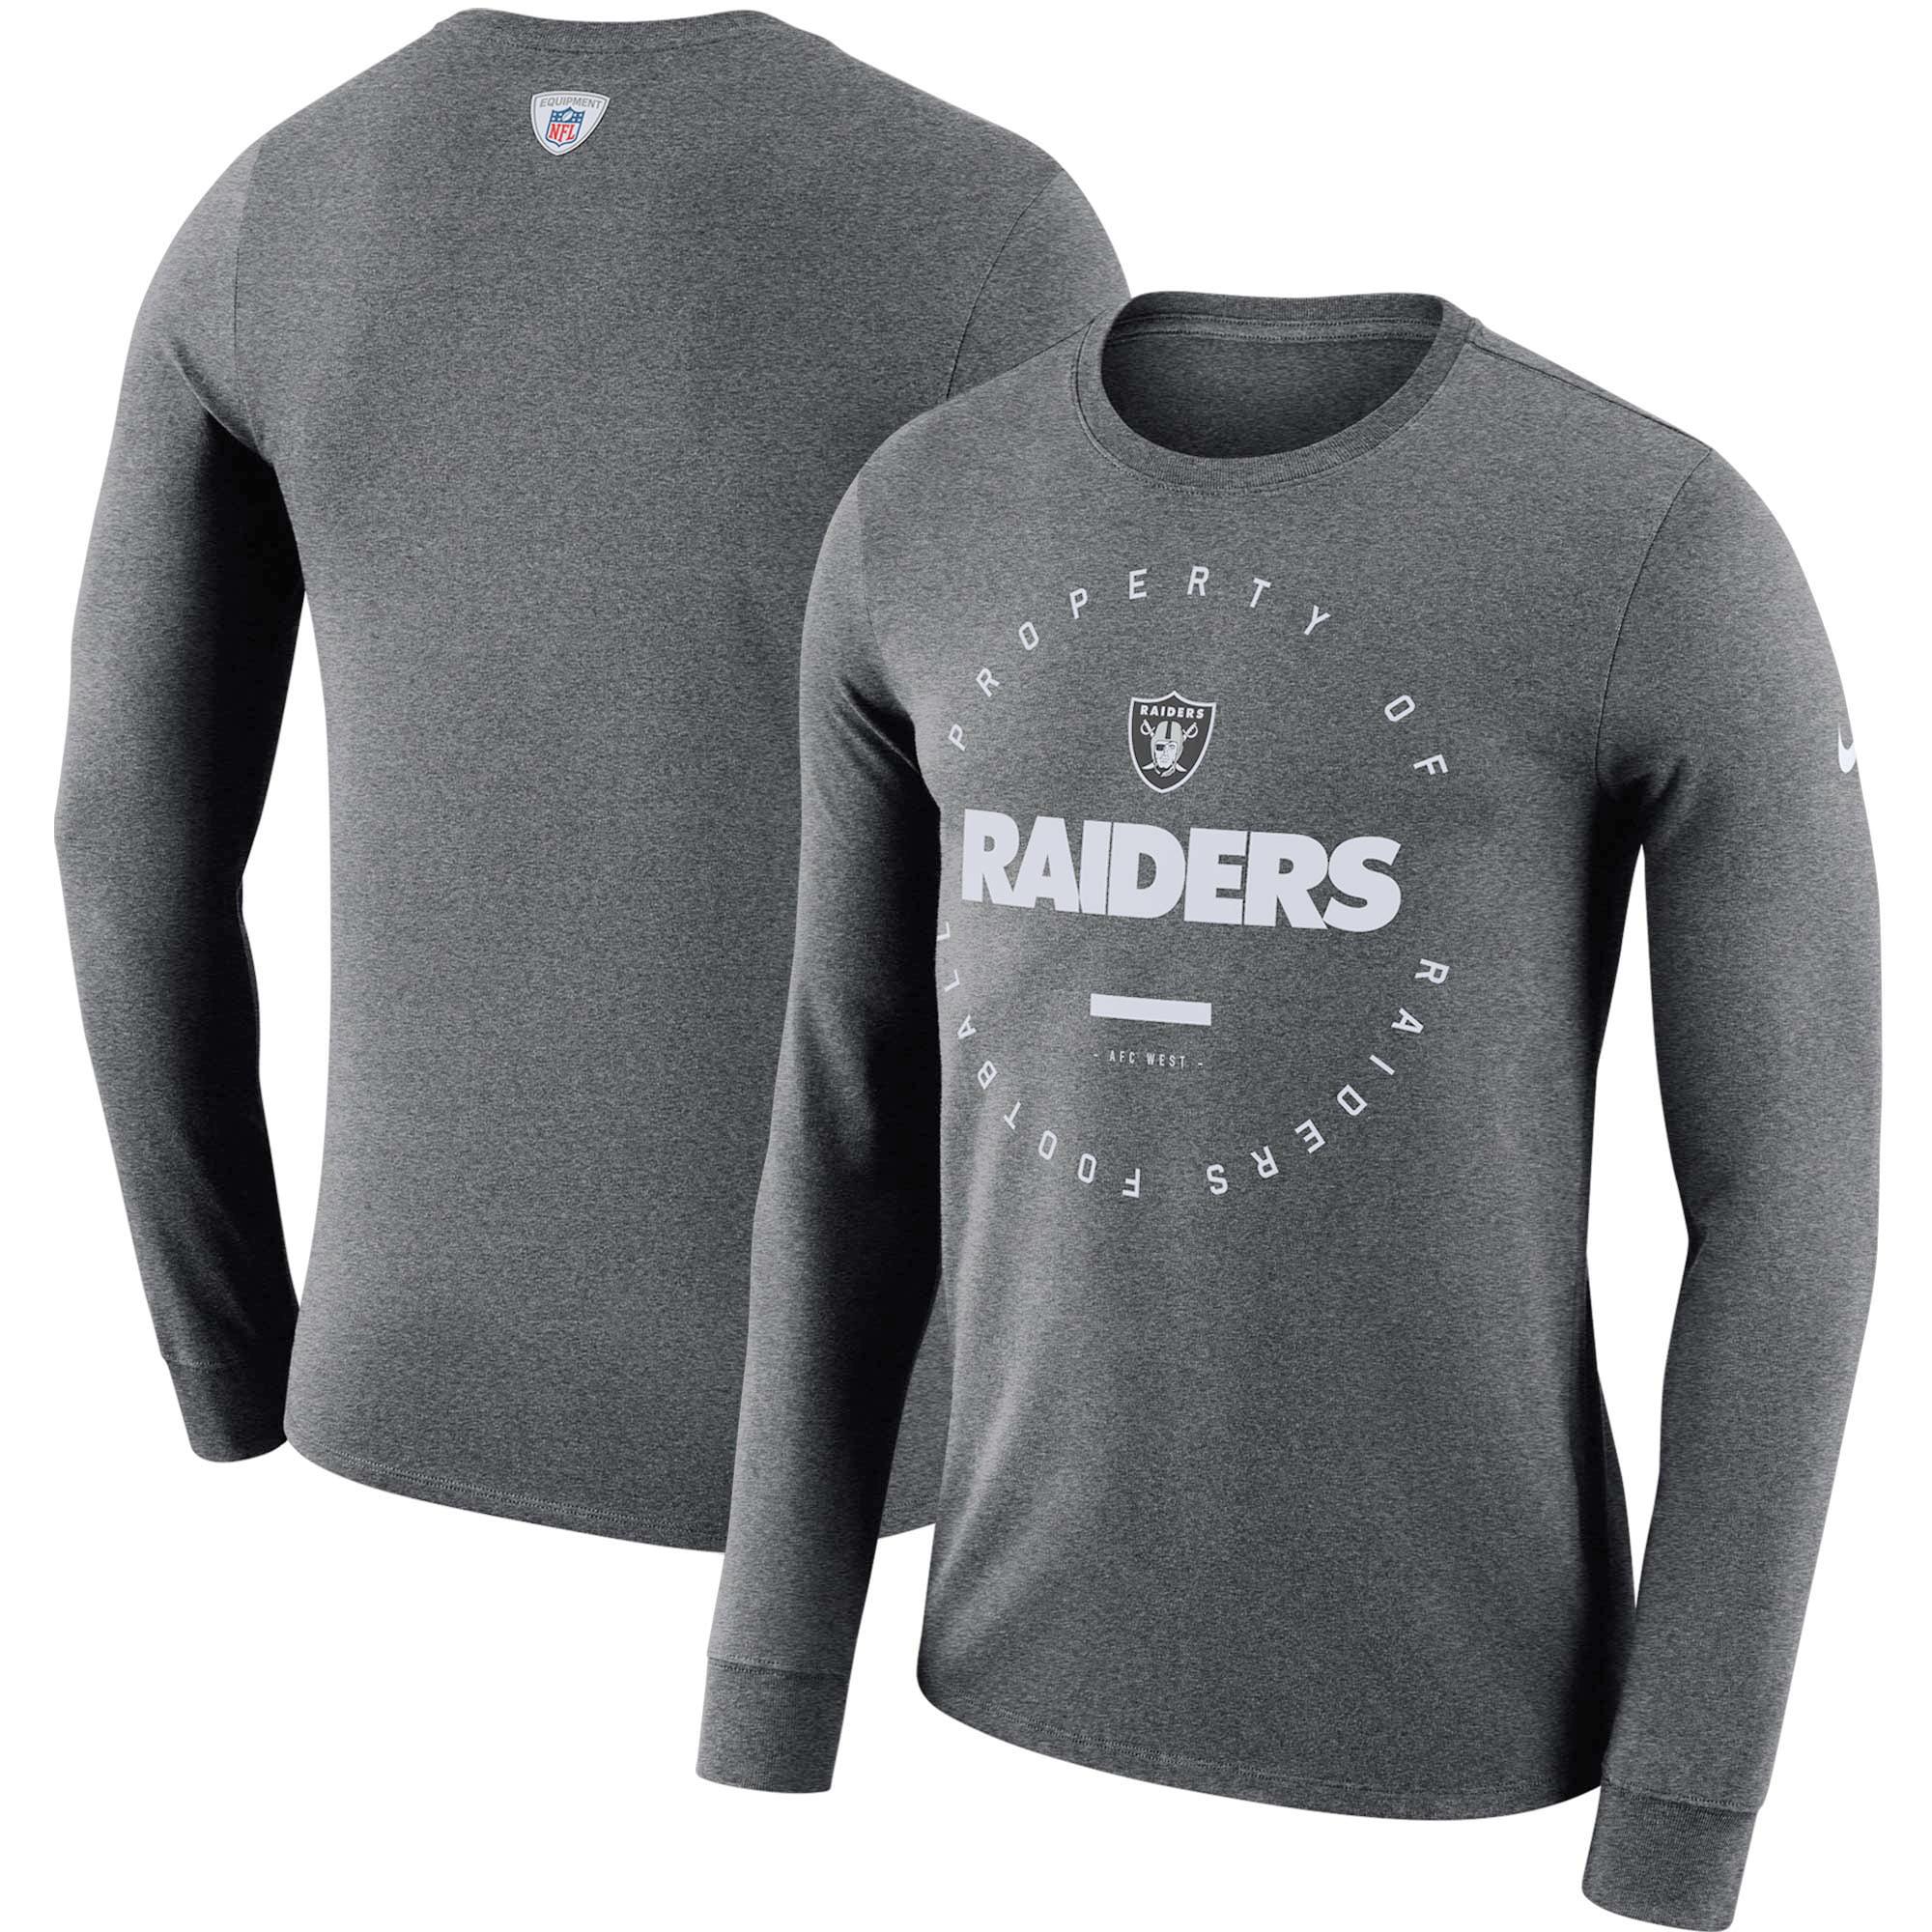 Oakland Raiders Nike Sideline Property Of Performance Long Sleeve T-Shirt - Charcoal